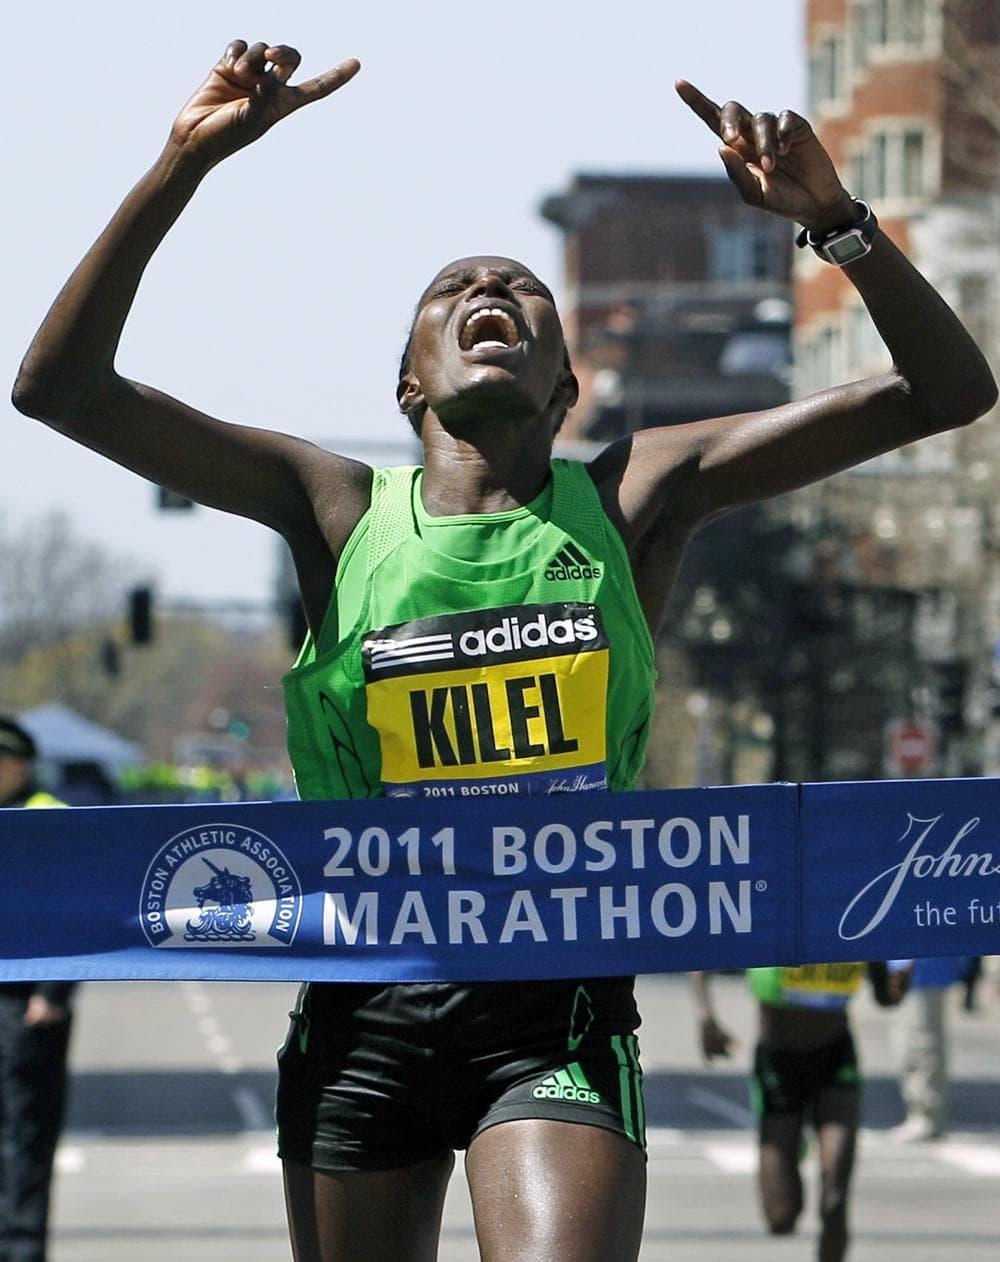 Winner Caroline Kilel of Kenya reacts as she crosses the finish line of the 115th Boston Marathon in Boston Monday. (AP)